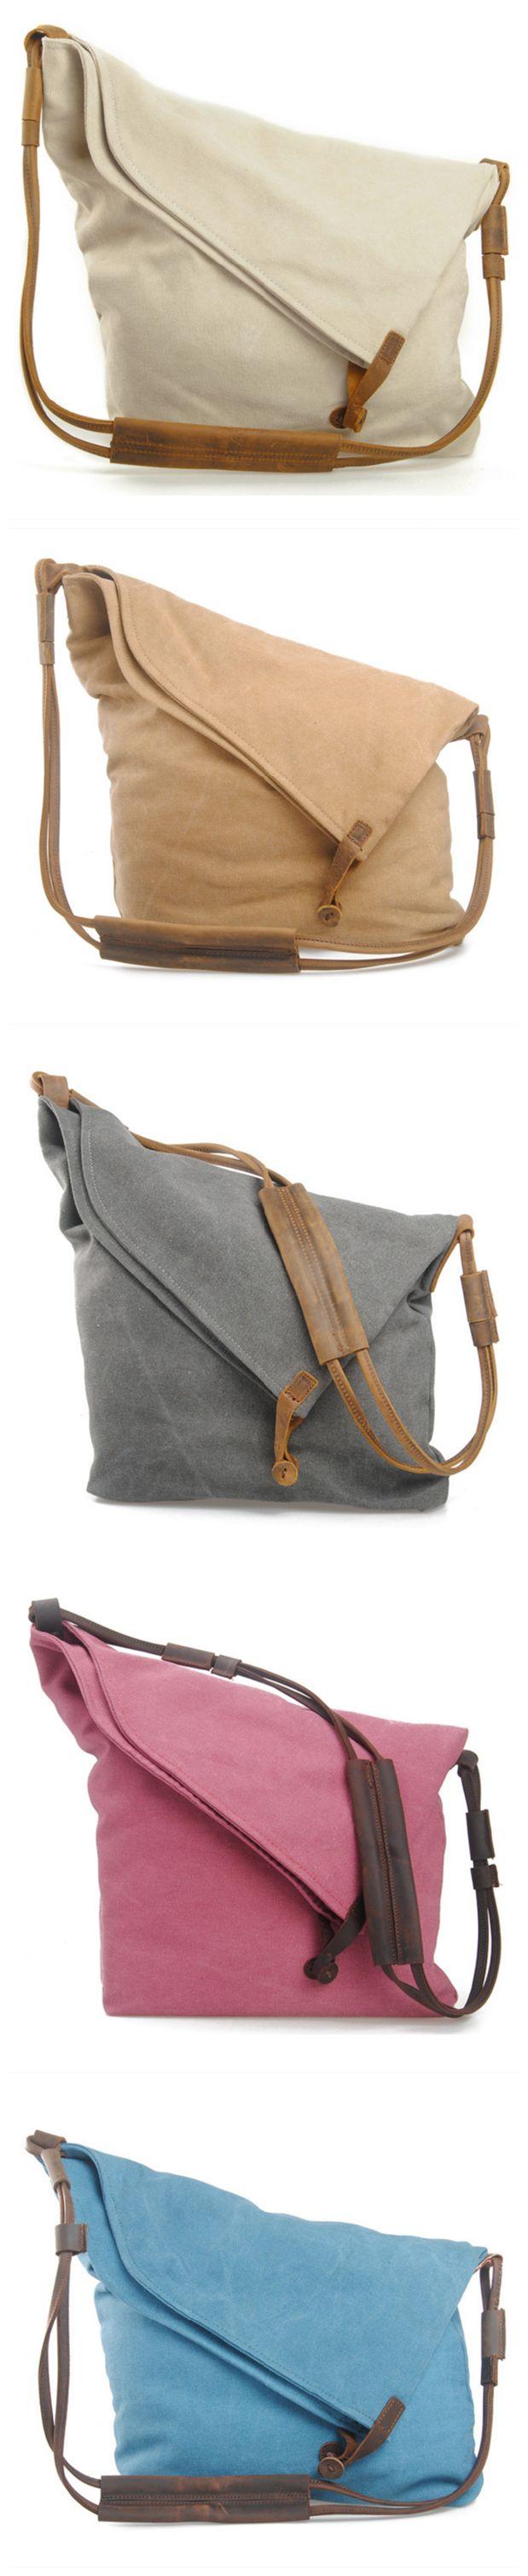 I love messenger bags! More